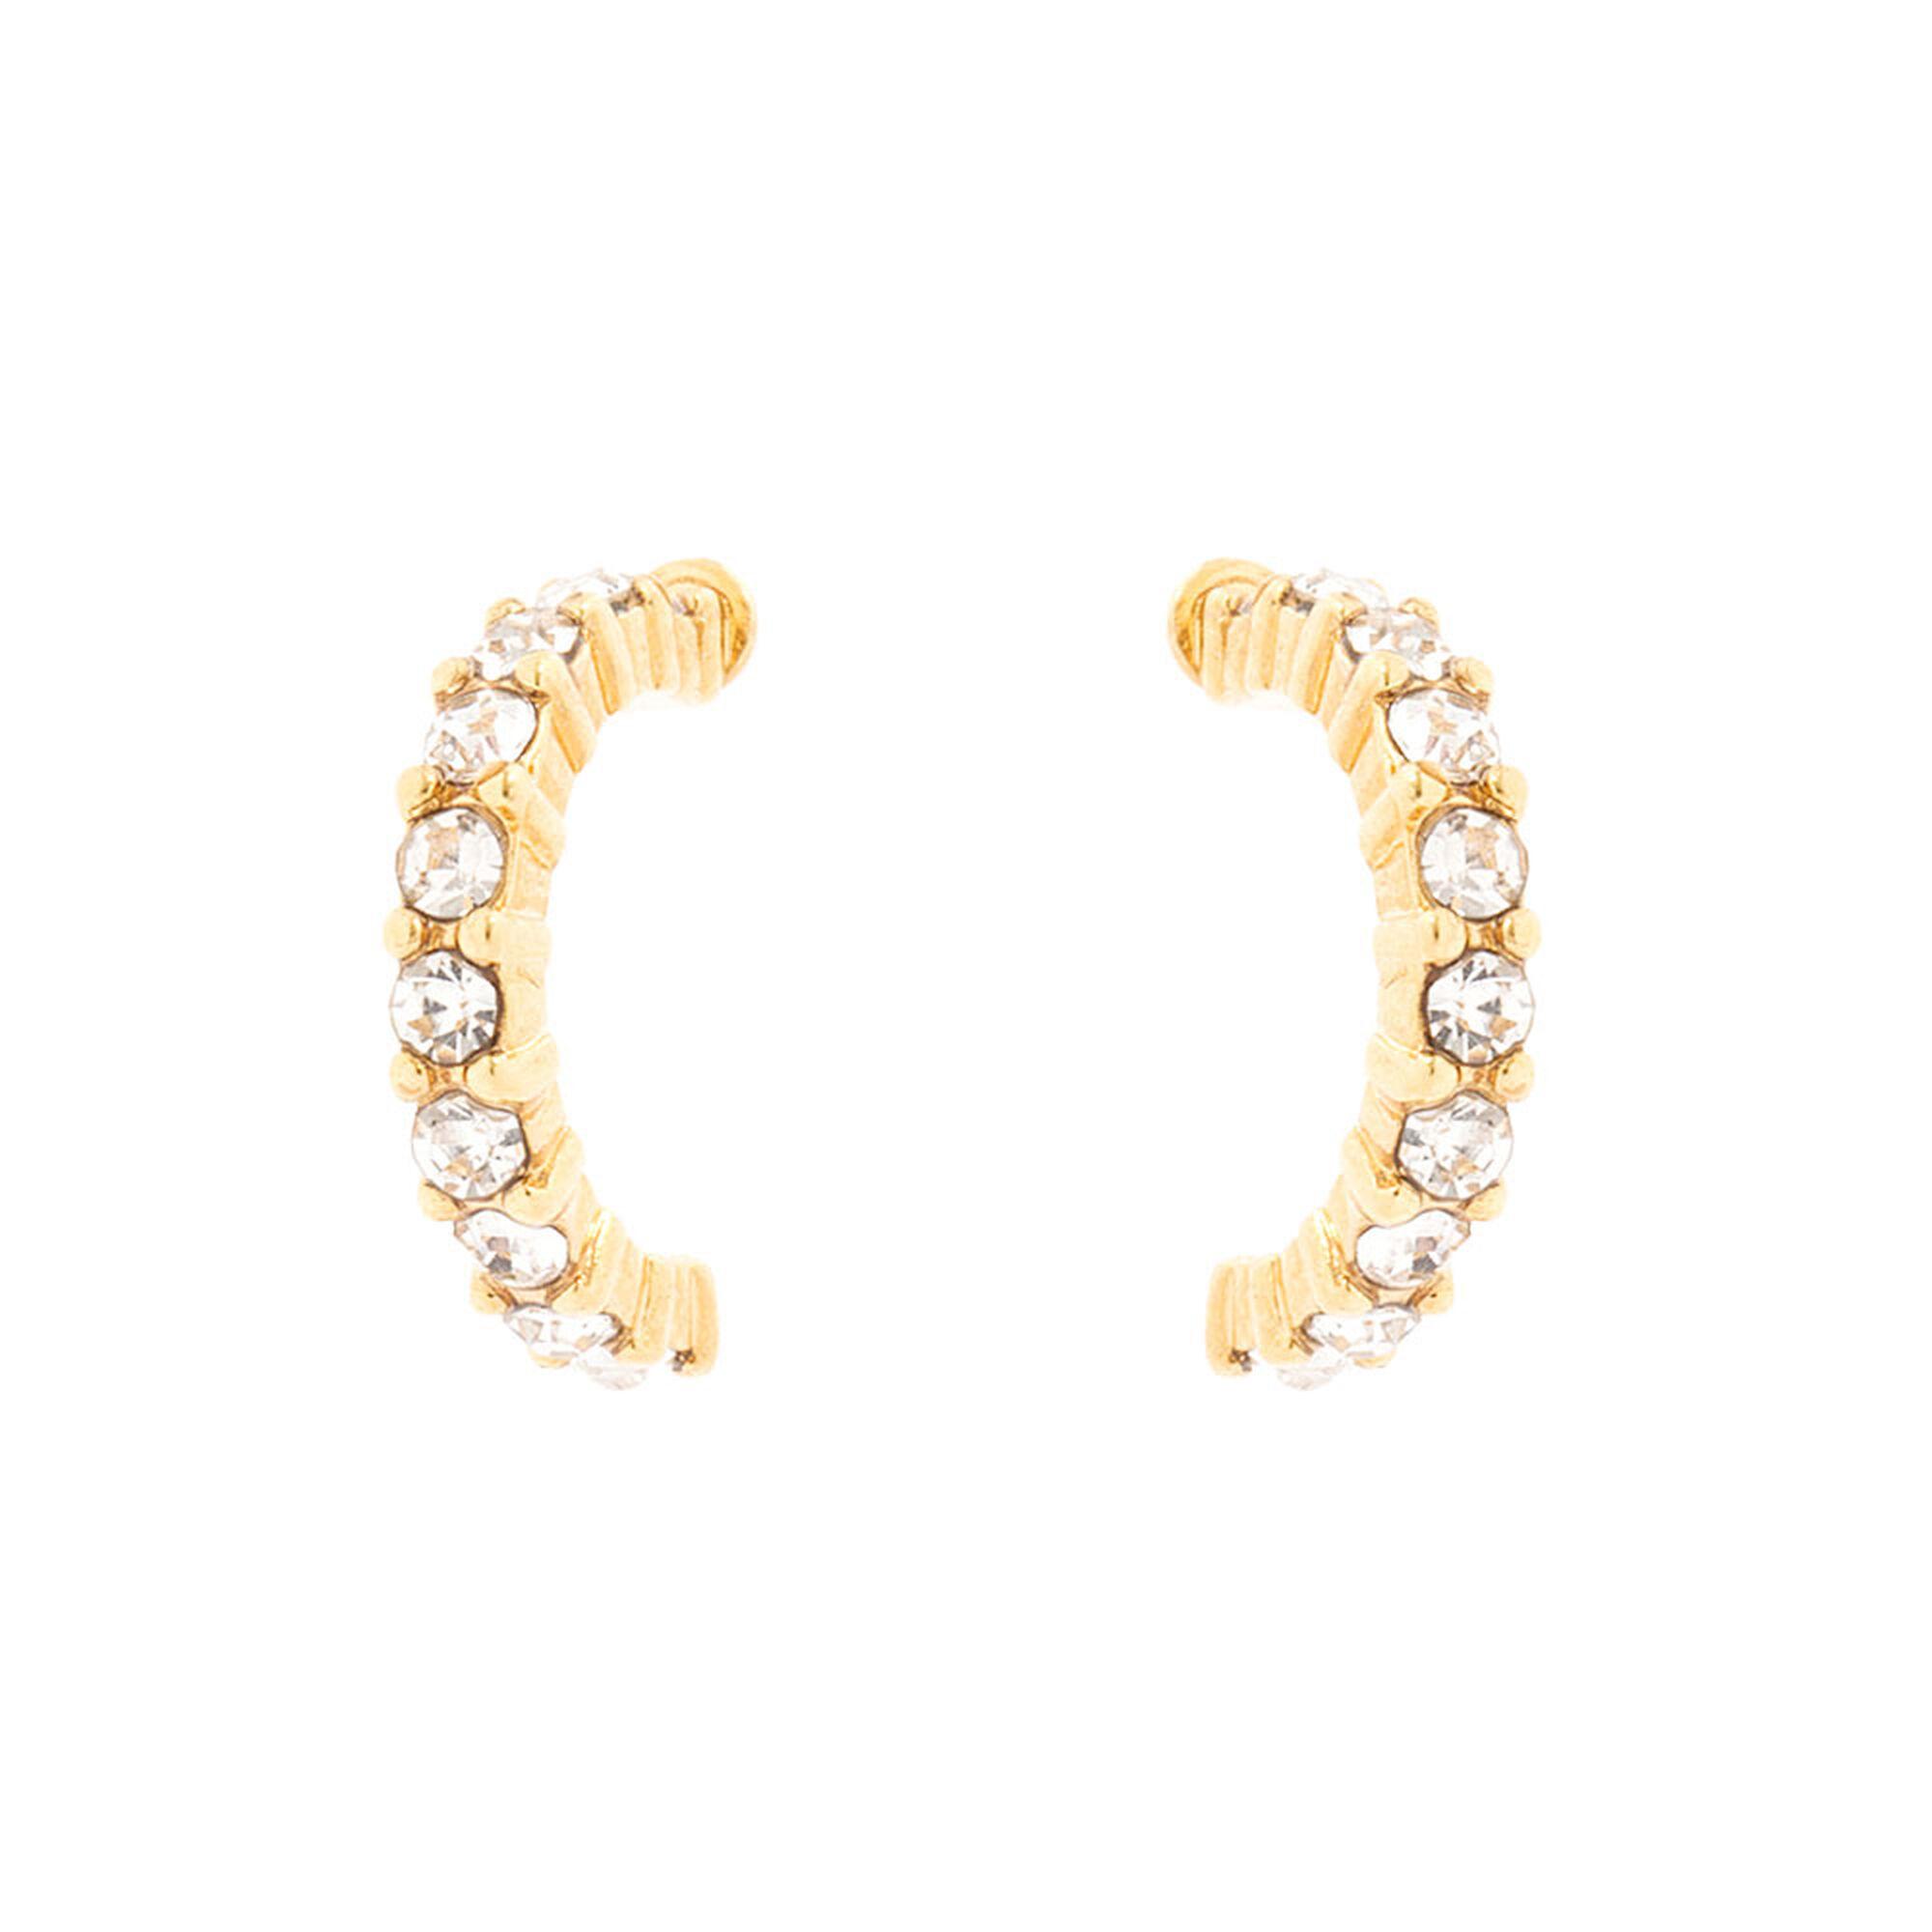 18kt Gold Plated Gl Stone Half Hoop Earrings